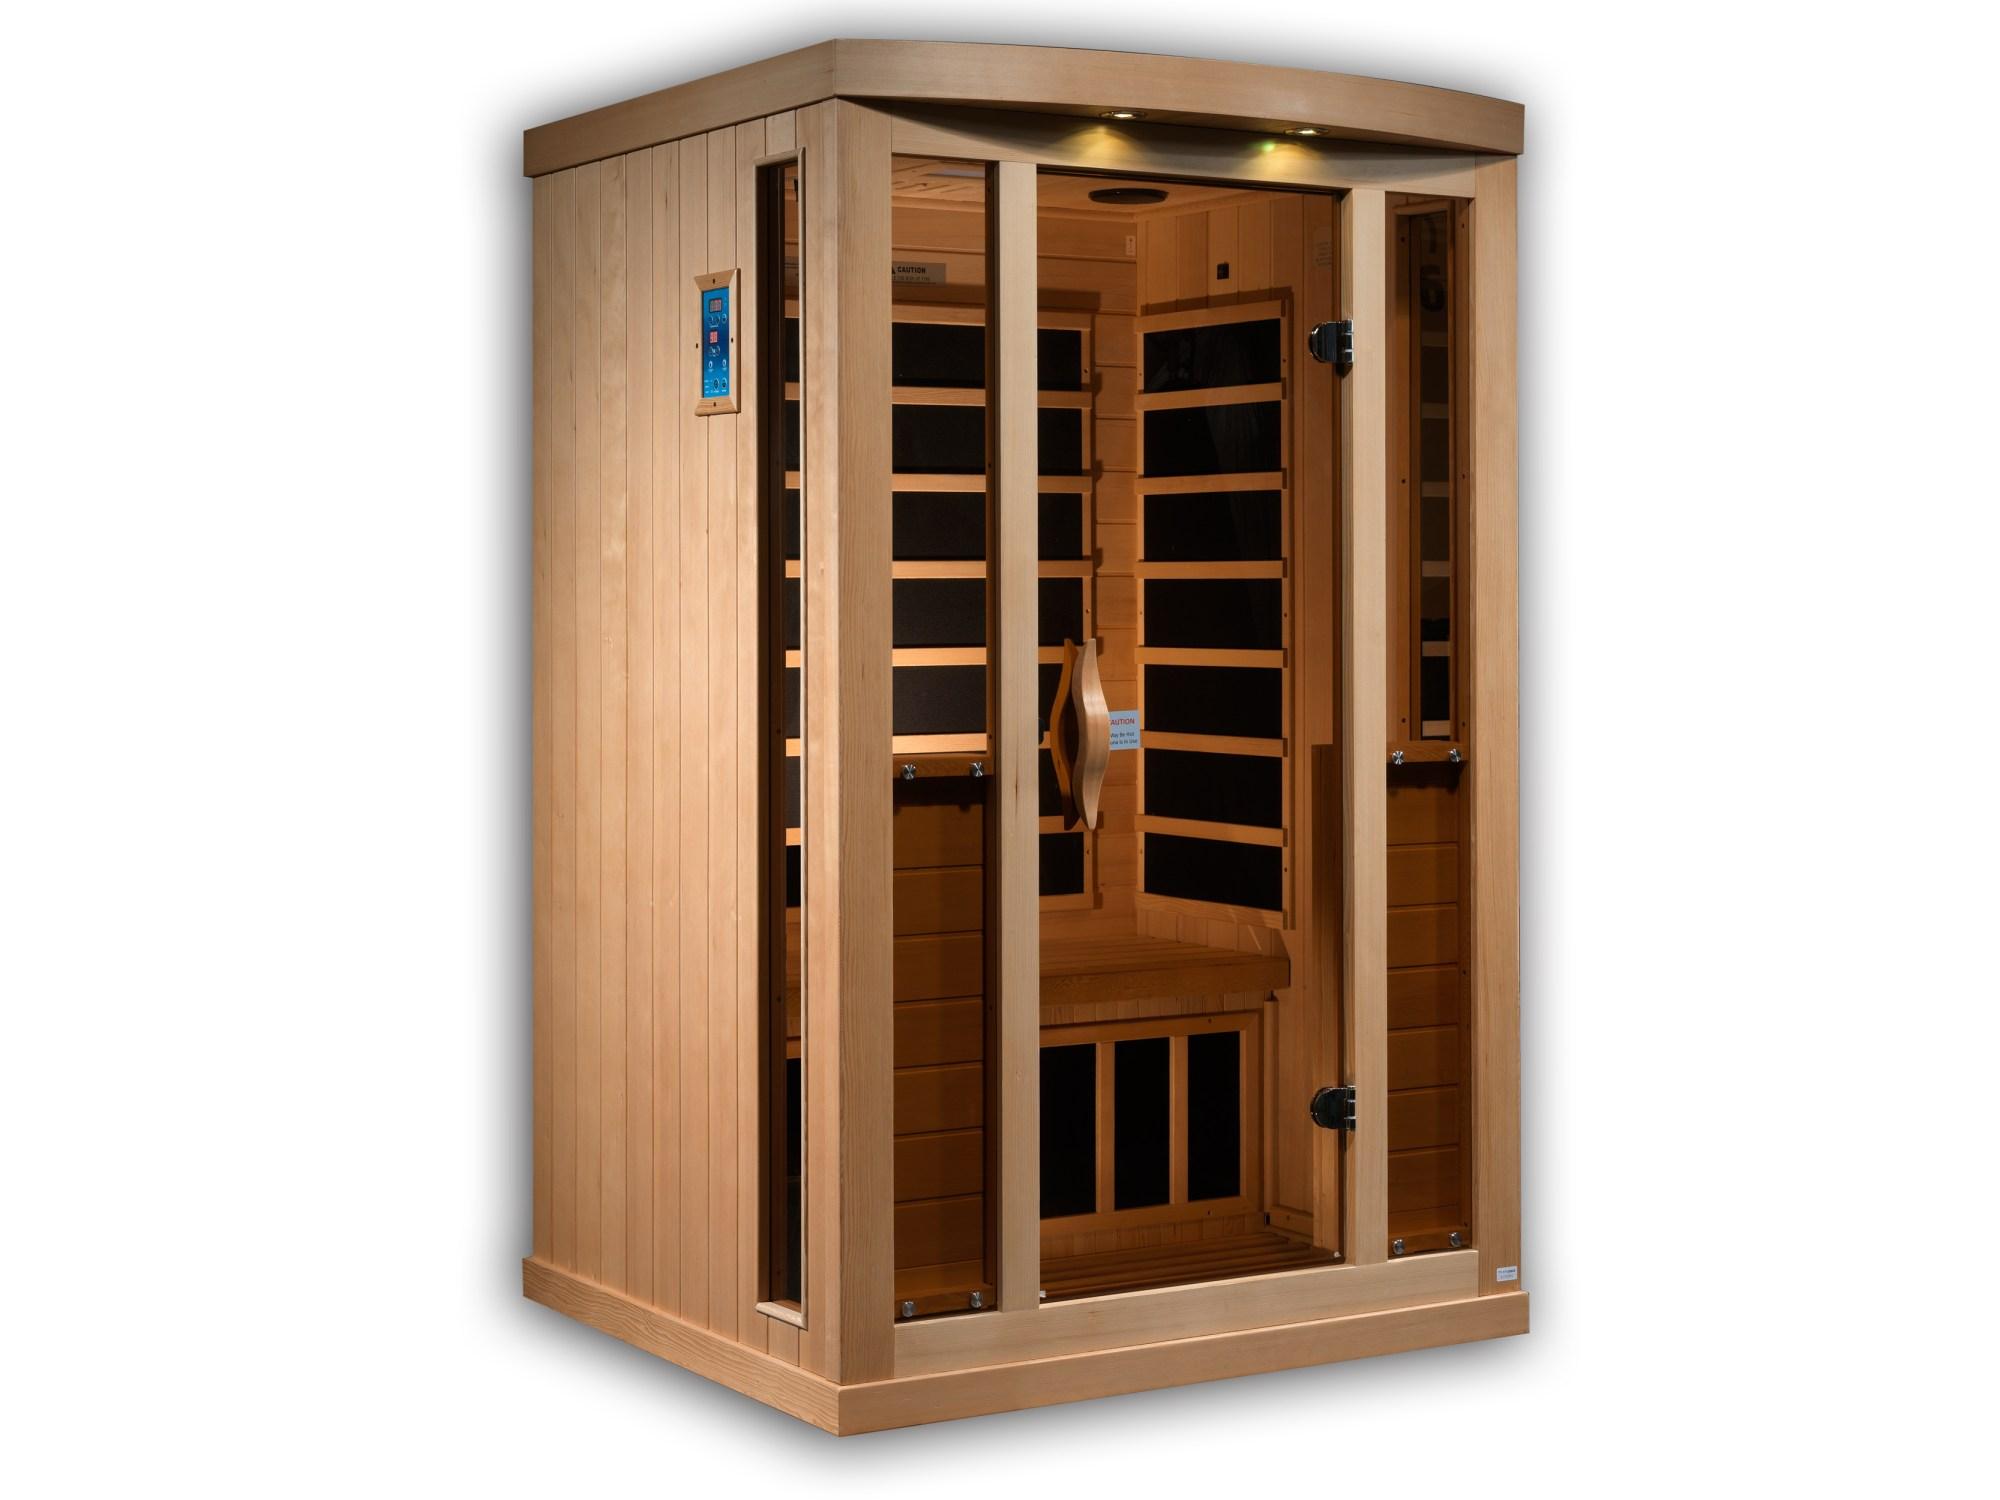 hight resolution of the sunrise 2 person full spectrum medical grade sauna celebration saunas infrared saunas best quality home saunas